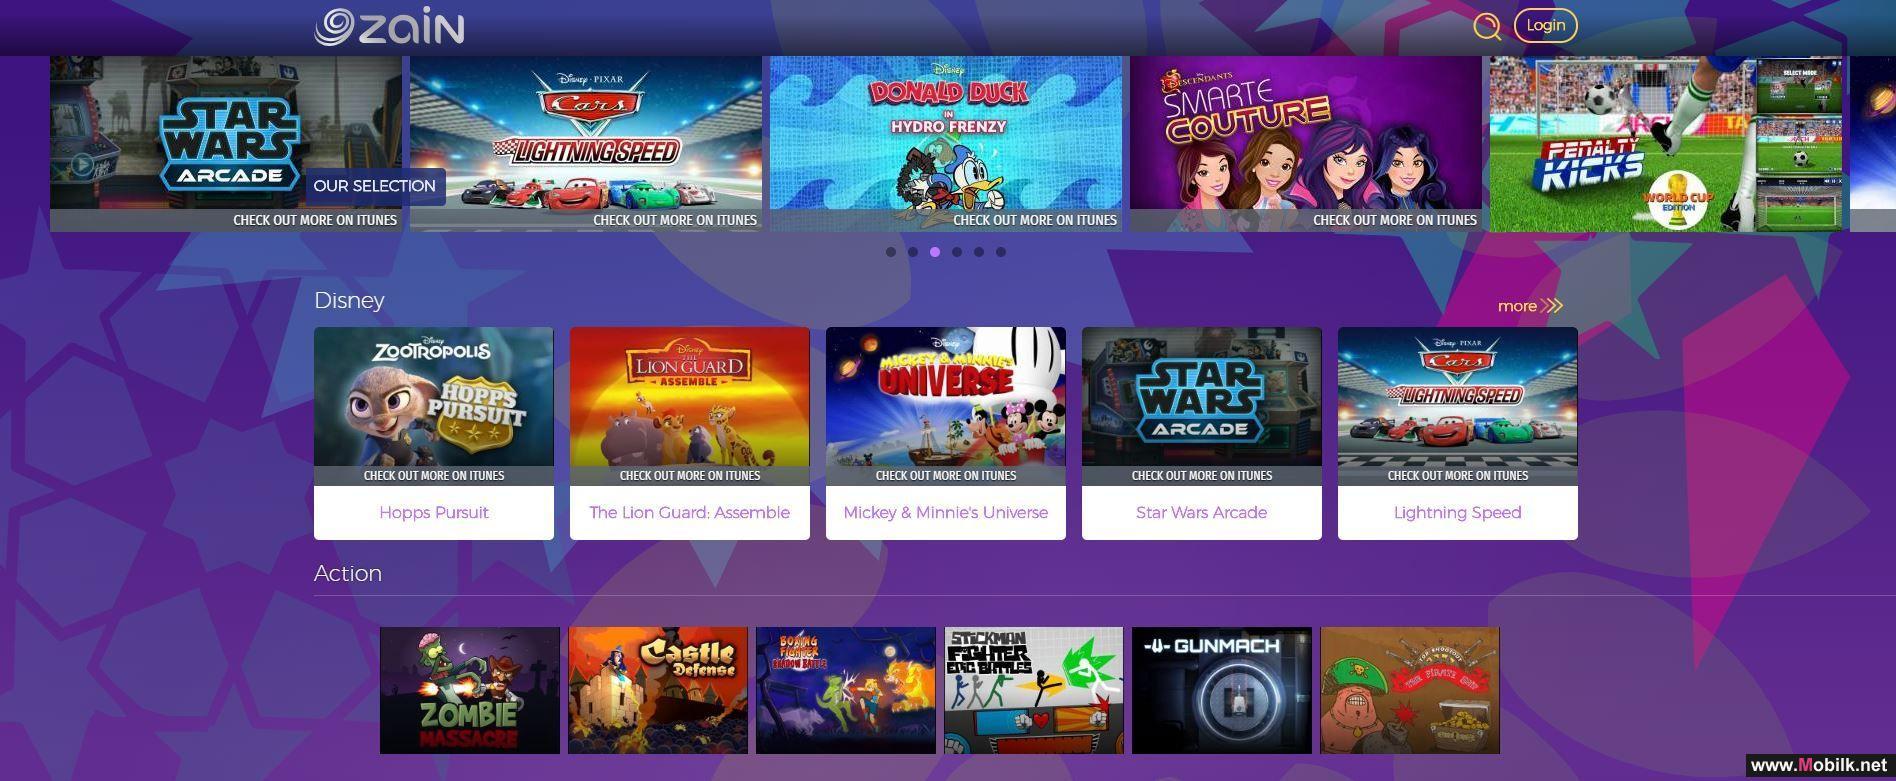 DOCOMO Digital تُطلق منصّة للألعاب الإلكترونية مع